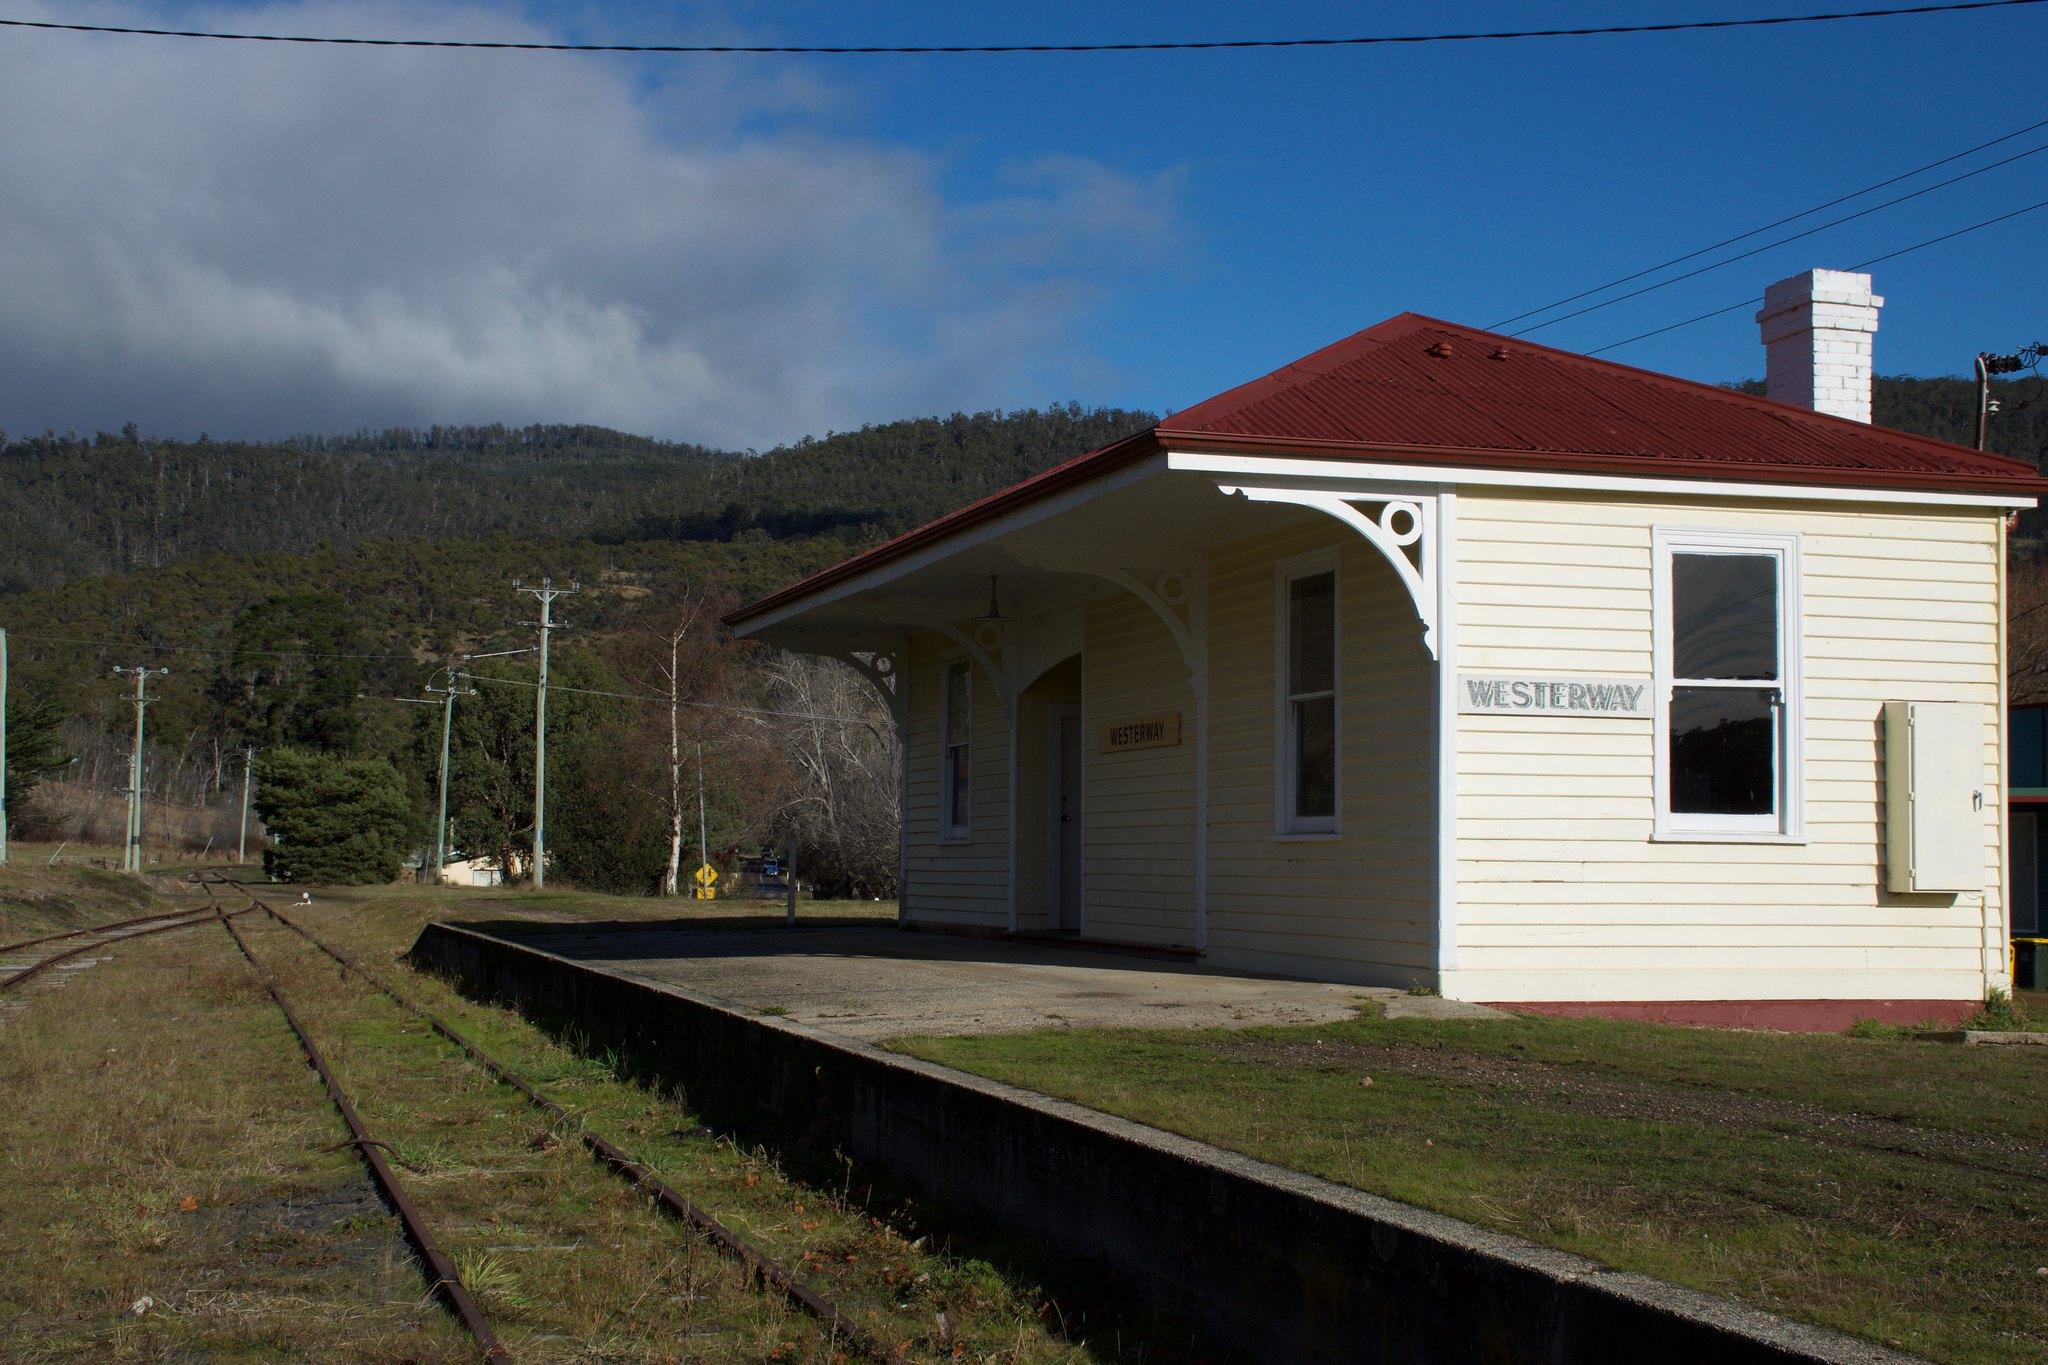 Westerway Station